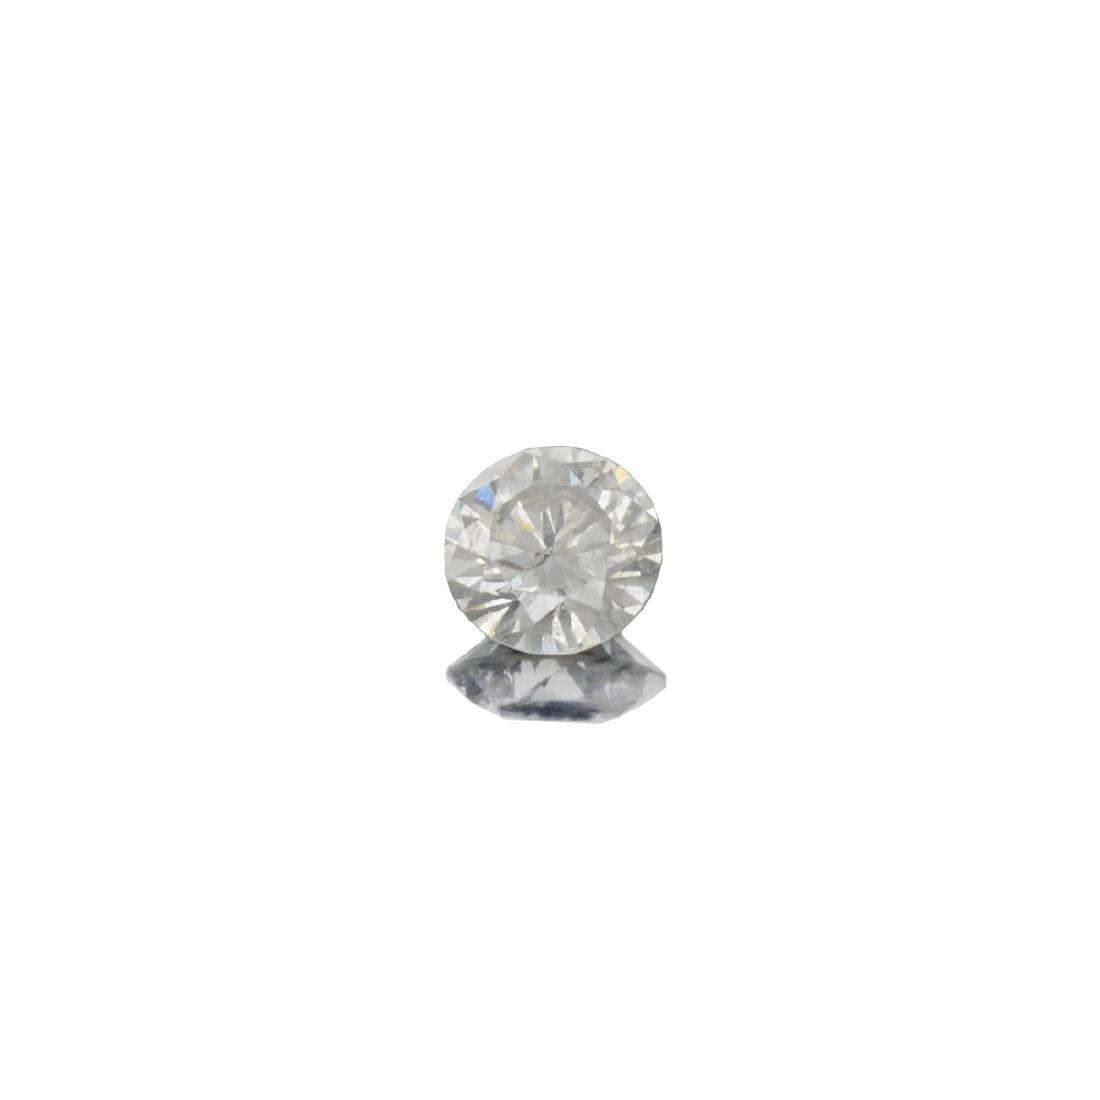 Fine Jewelry GIA Certified 0.18CT Round Brilliant Cut